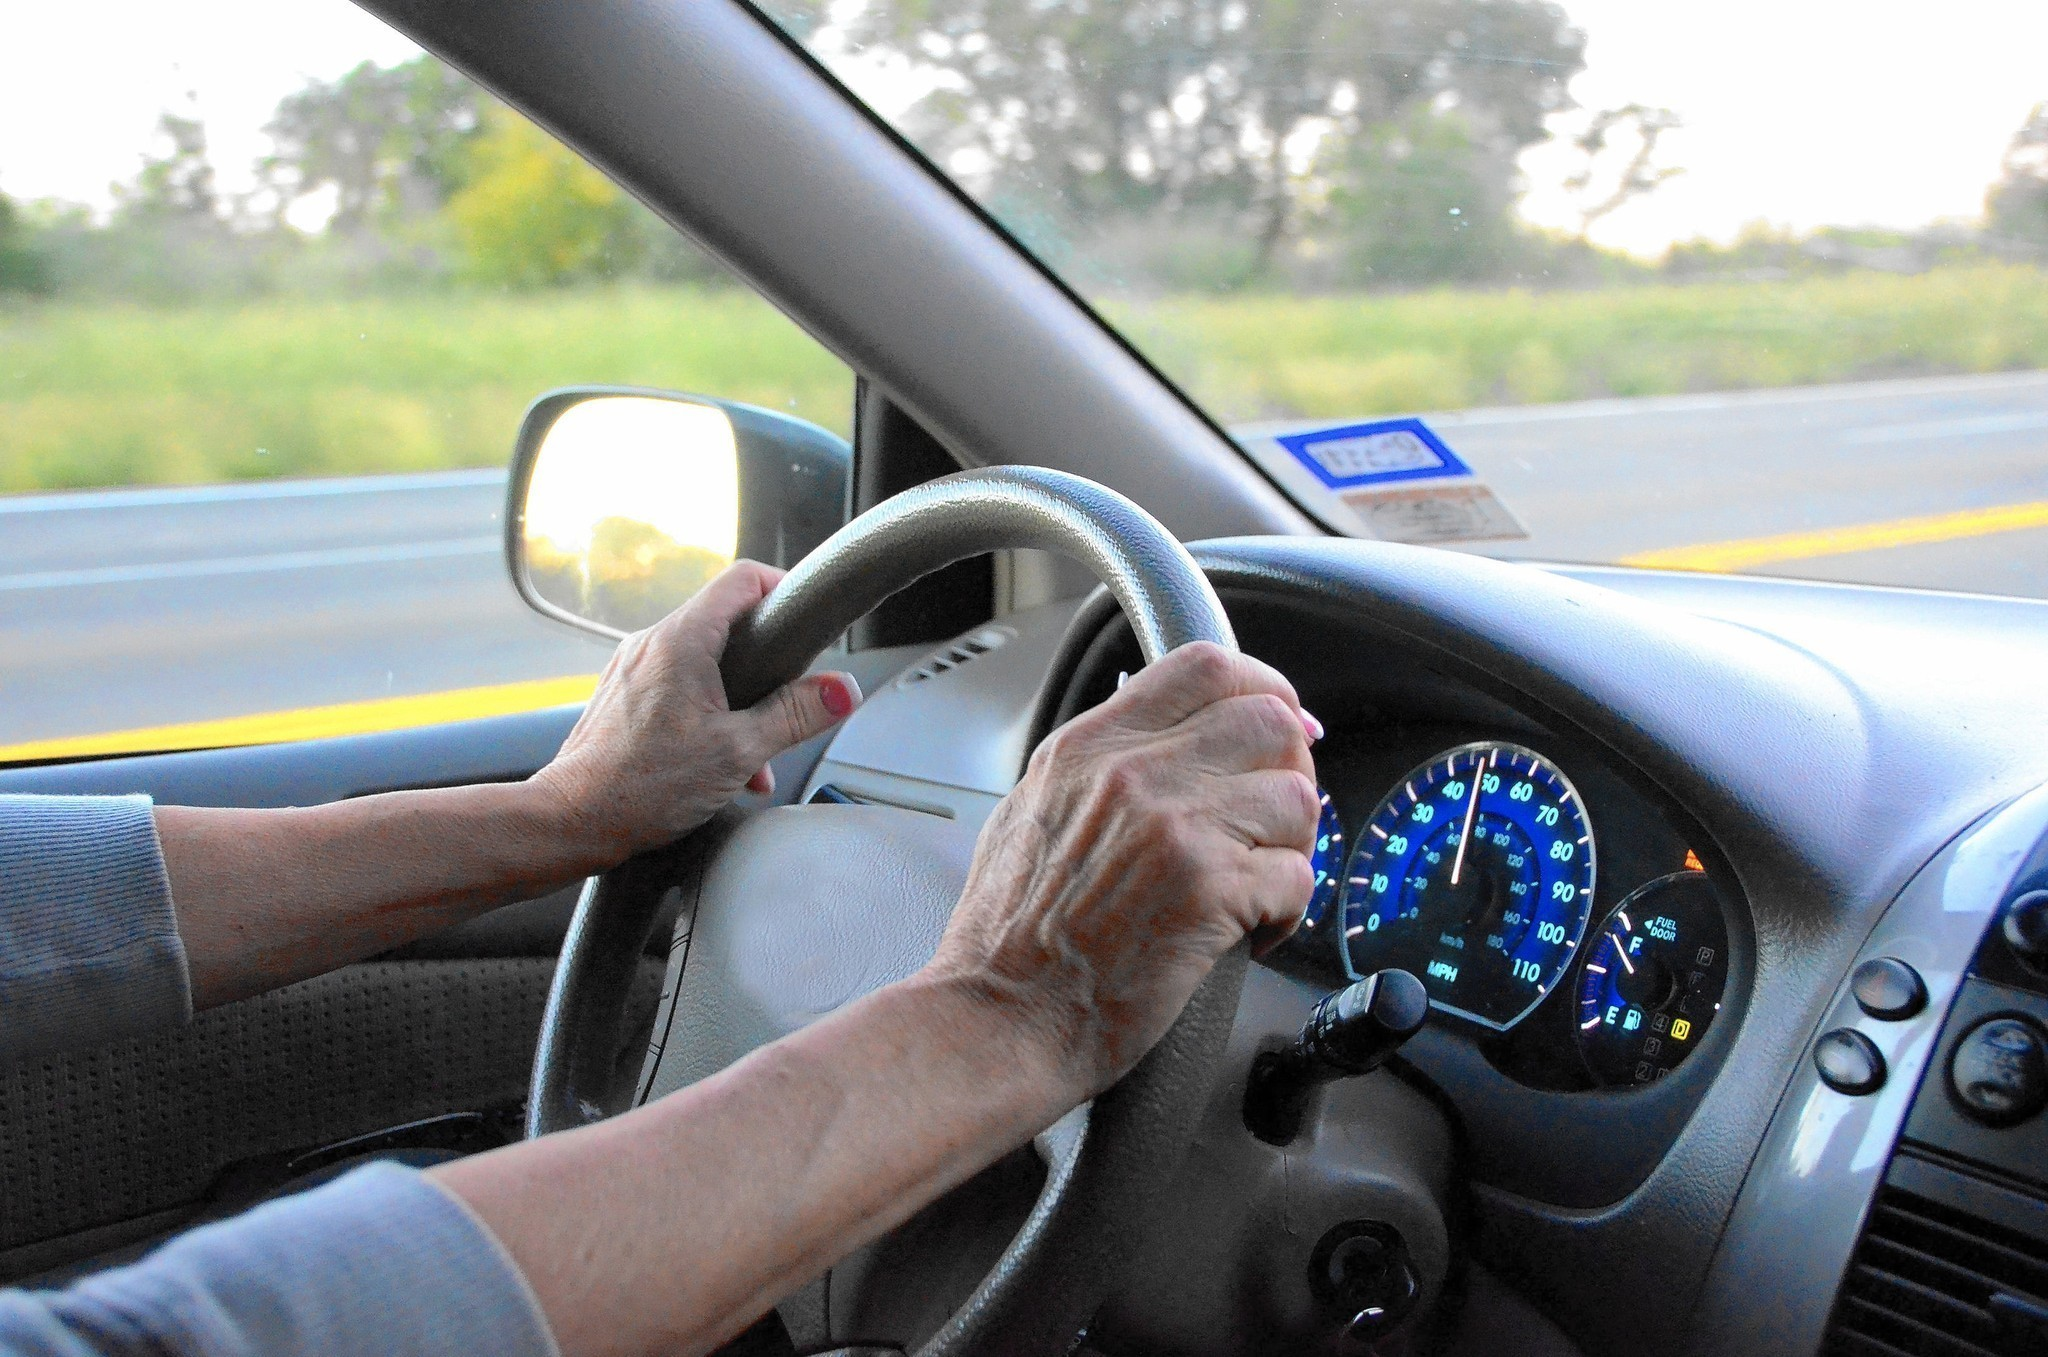 Senior drivers confront proliferation of new car technology chicago tribune